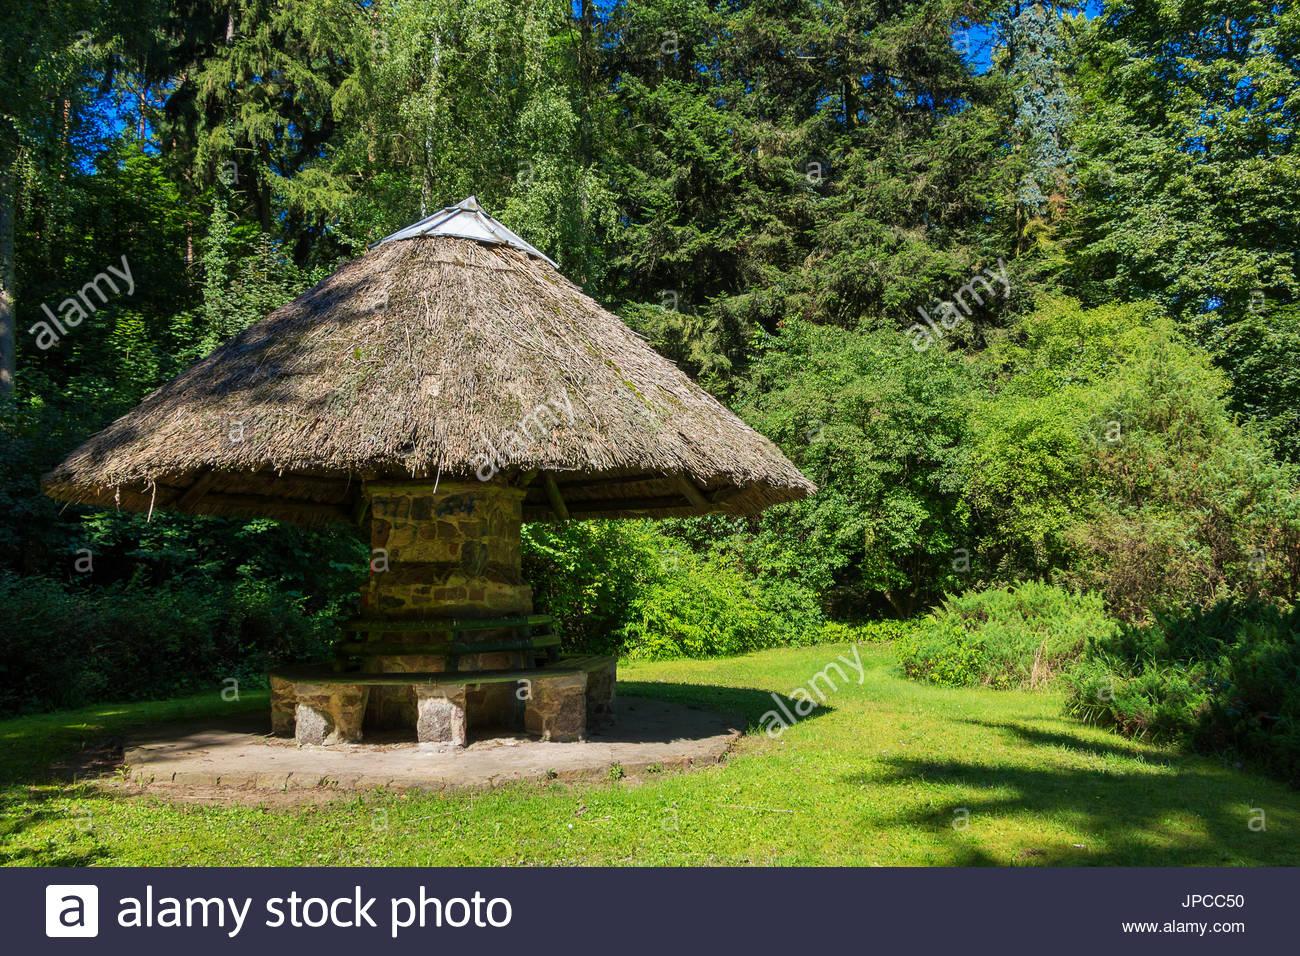 hiker-refuge-hut-in-forest-brandenburg-g